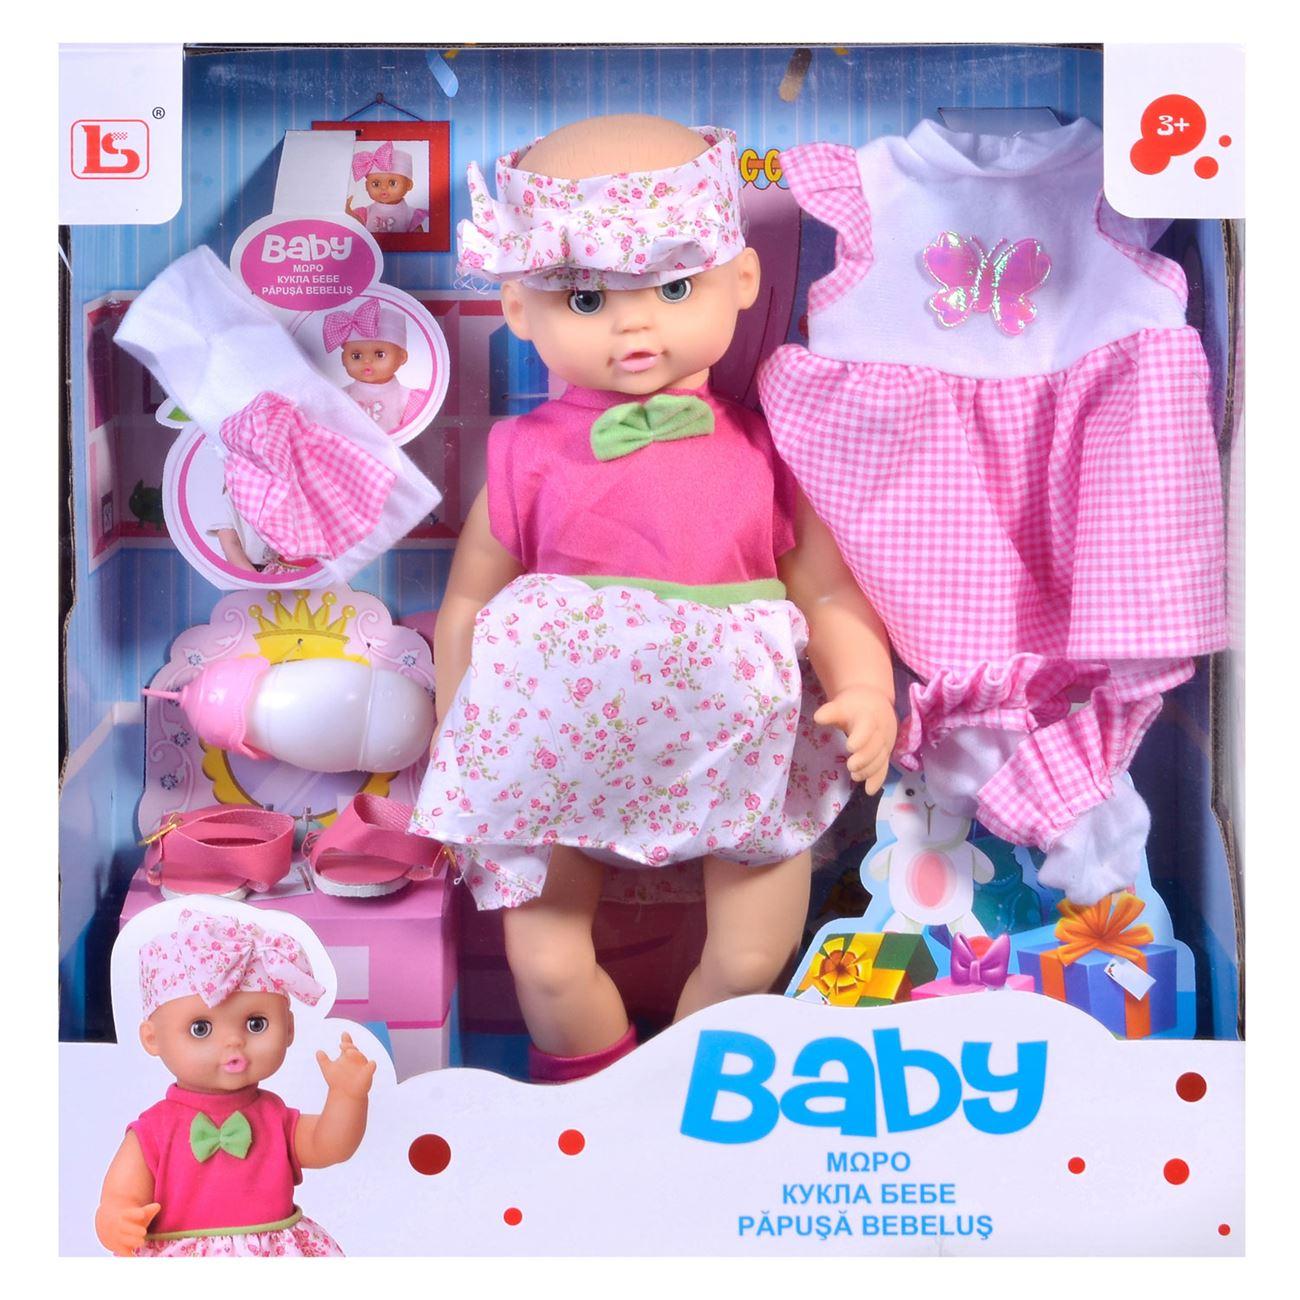 e9adeab513f Κούκλα Μωρό που Ψηλώνει & Αξεσουάρ < Μωράκια Μπαταρίας | Jumbo